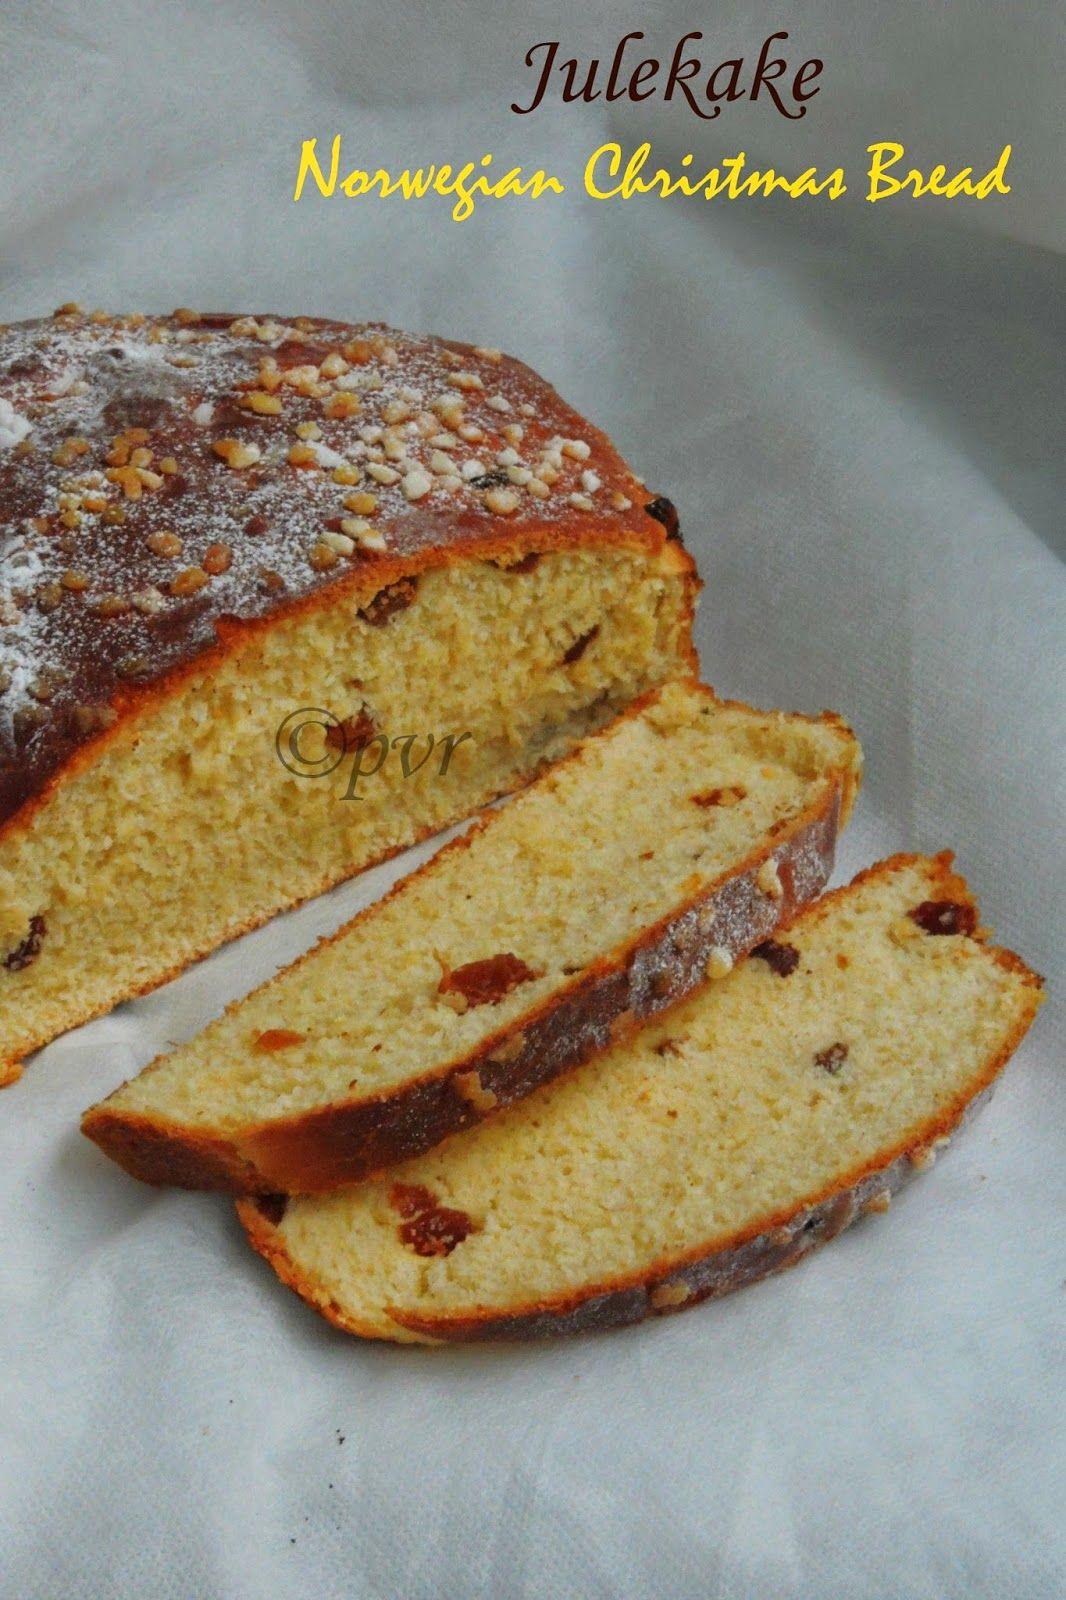 Julekake Version 2 - A Norwegian Christmas Bread | Yeast Breads ...